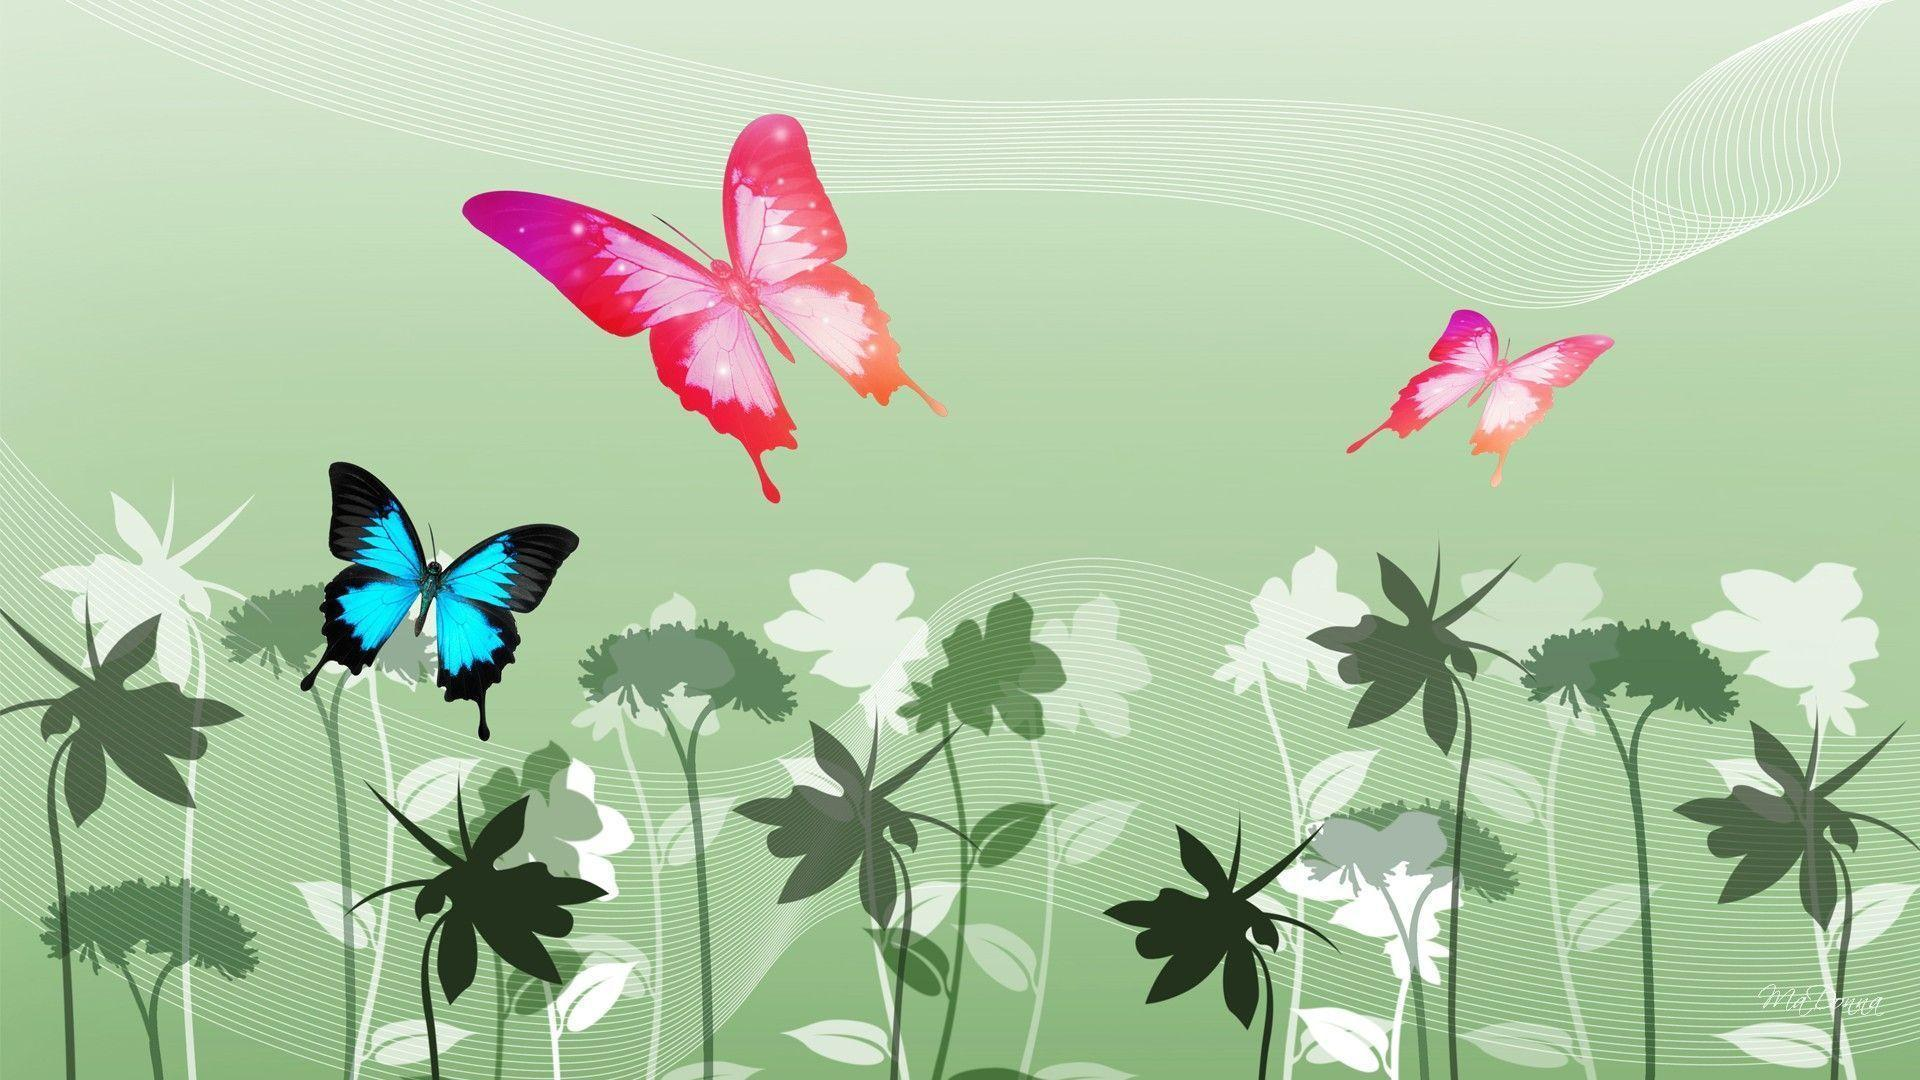 Обои с бабочкой баттерфляй